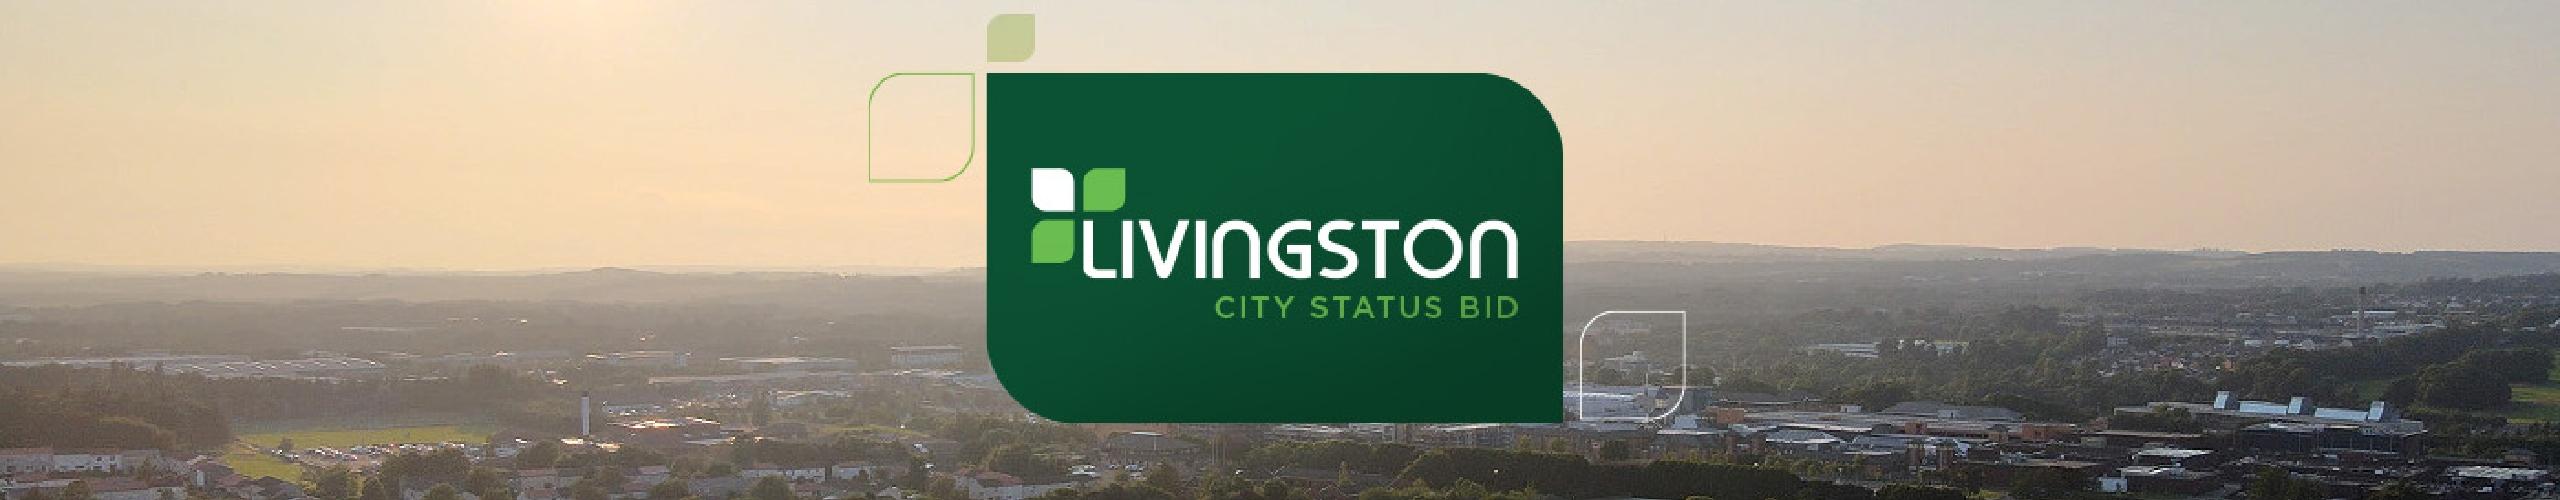 Livingston City Bid